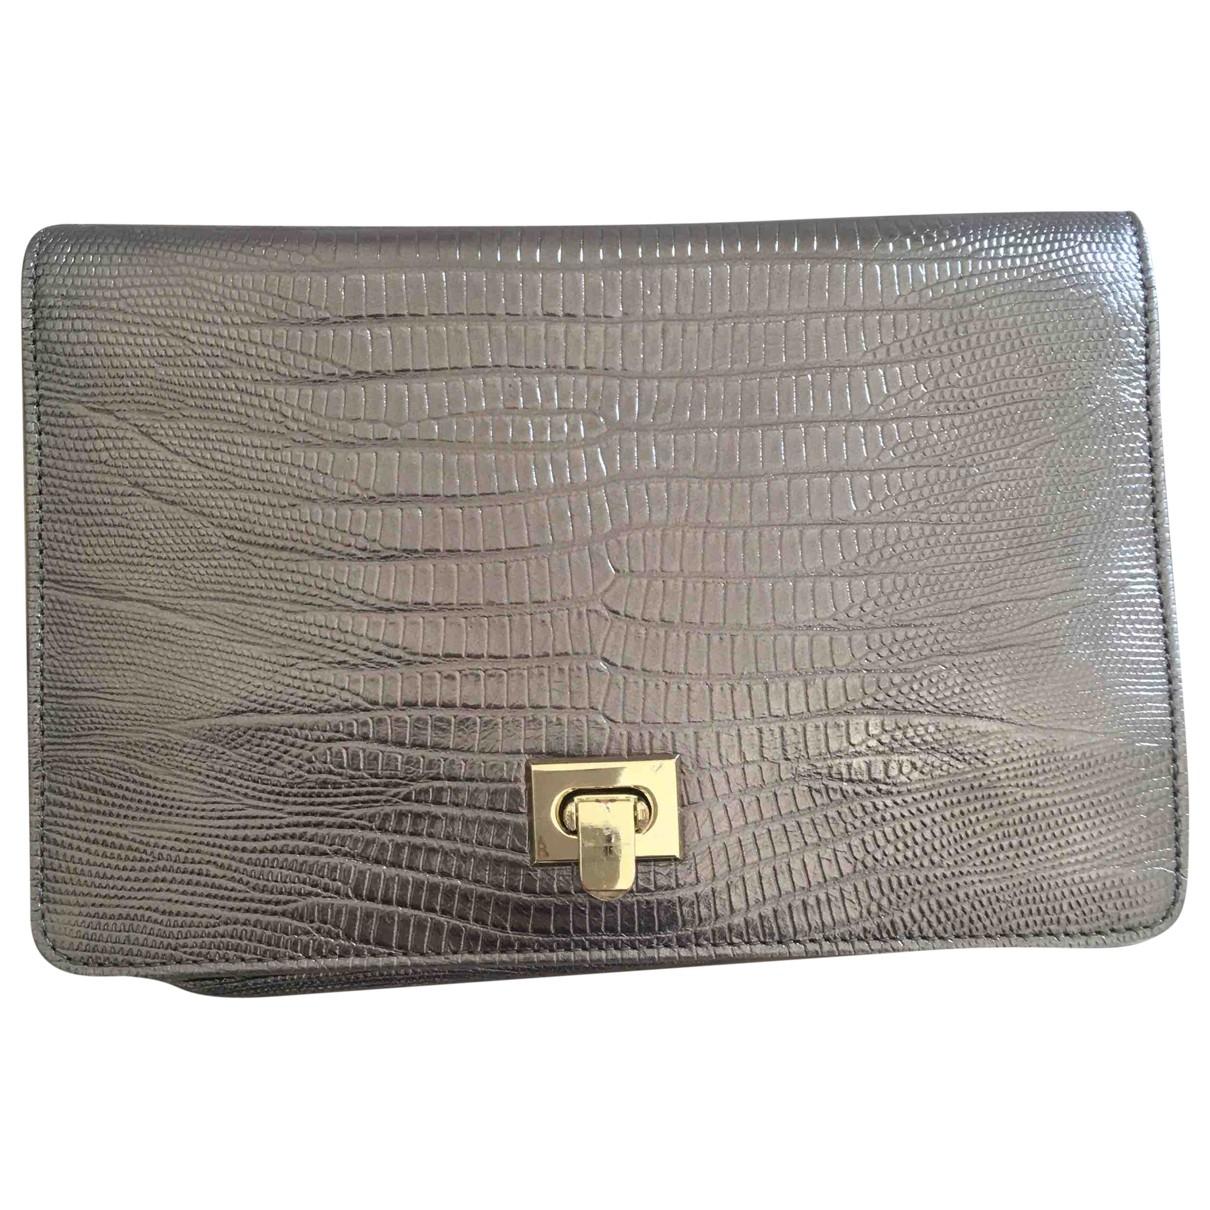 Uterque \N Metallic Leather Clutch bag for Women \N